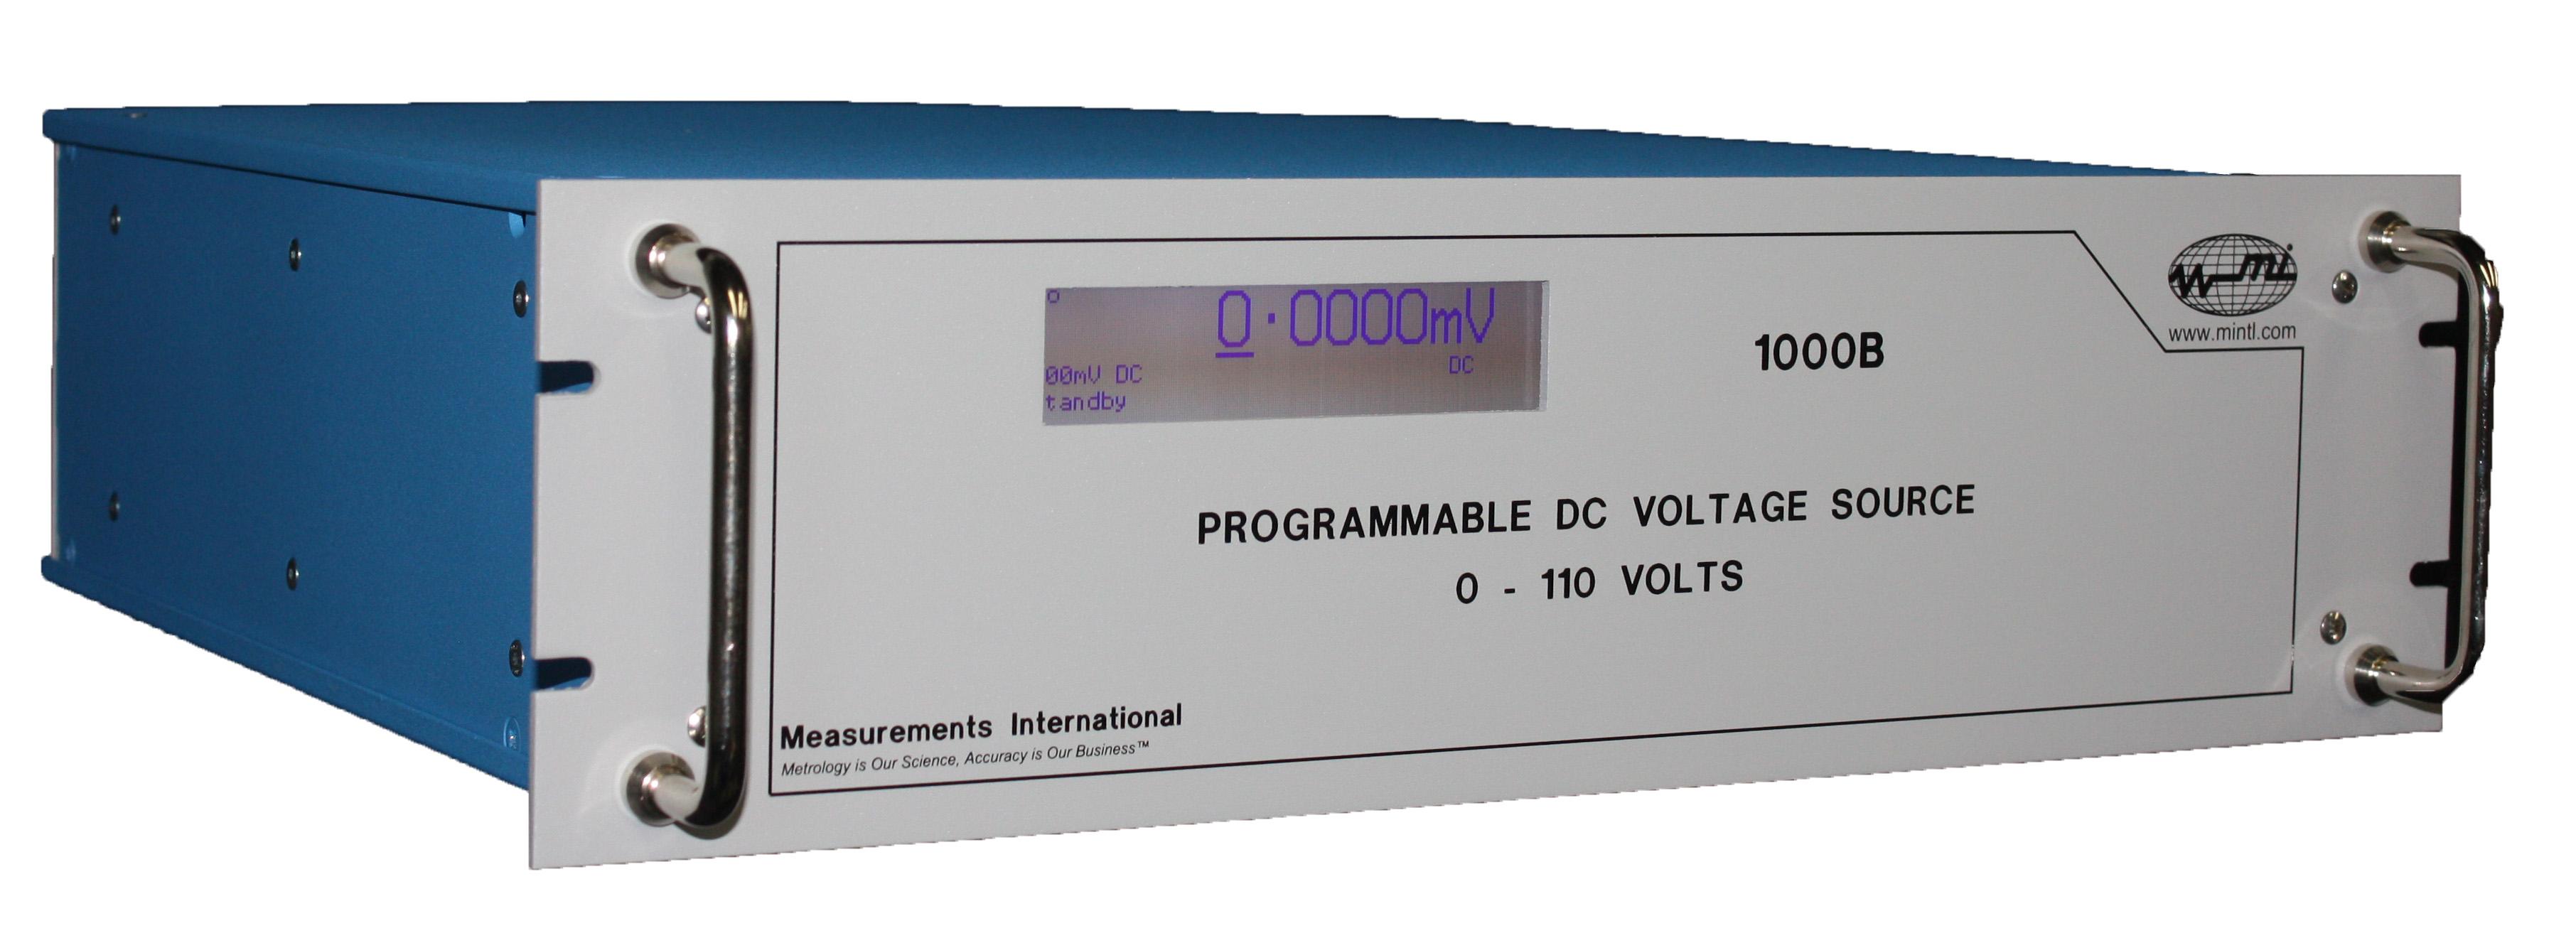 1000B Programmable DC Voltage Source